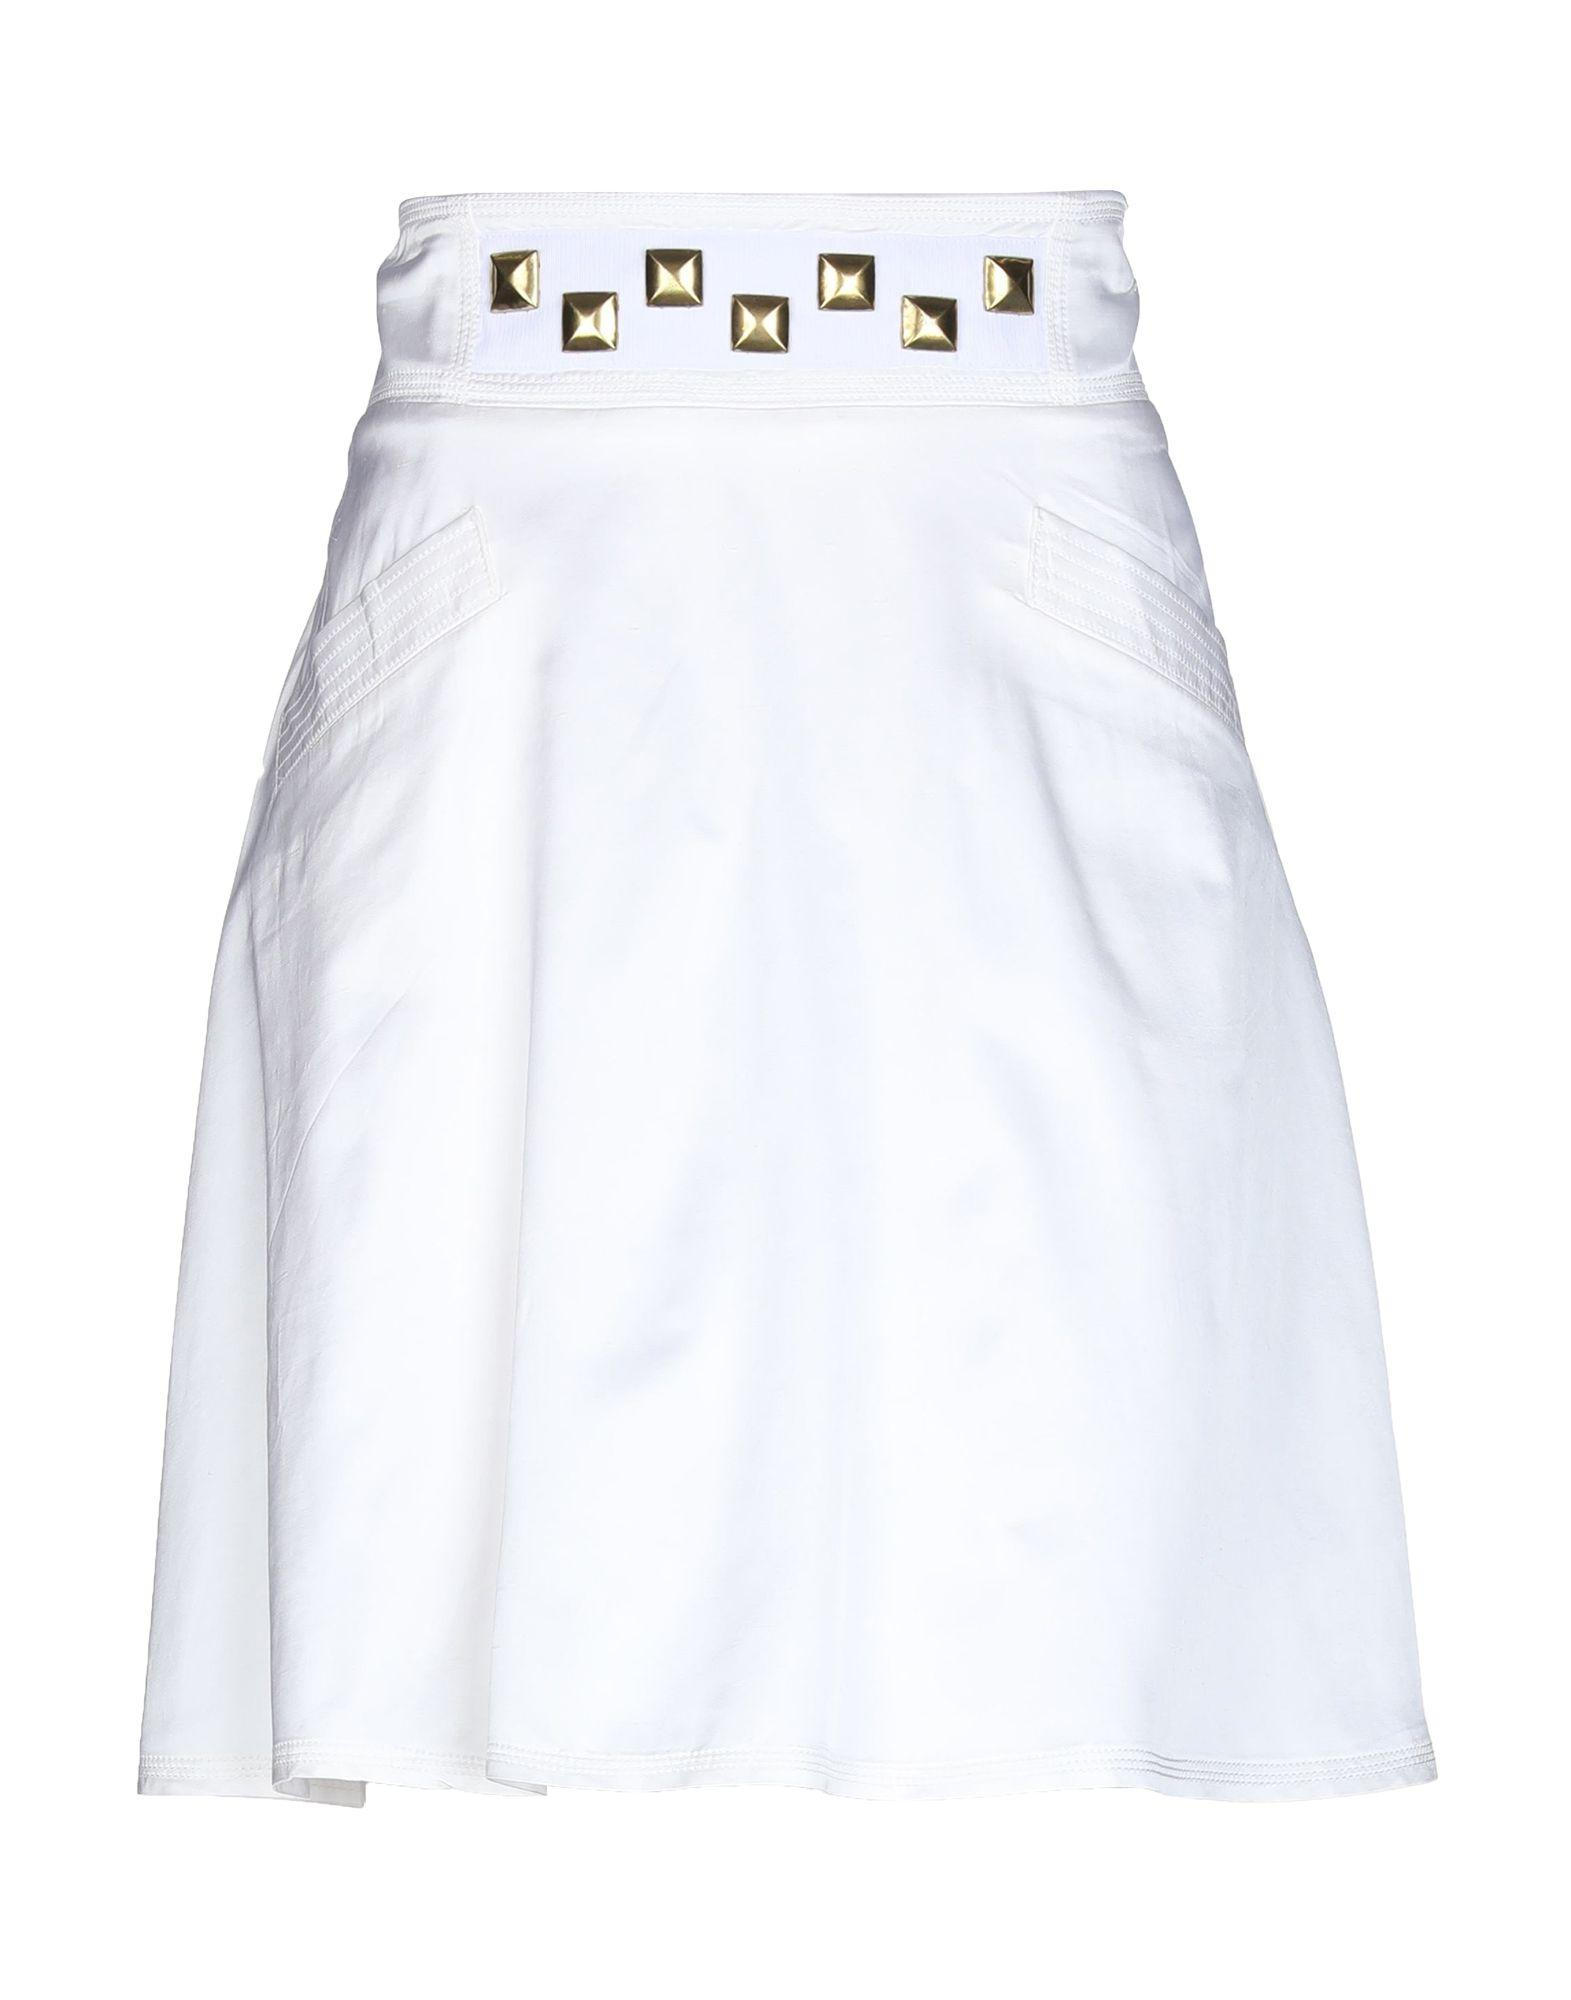 Юбка до колена  - Белый цвет